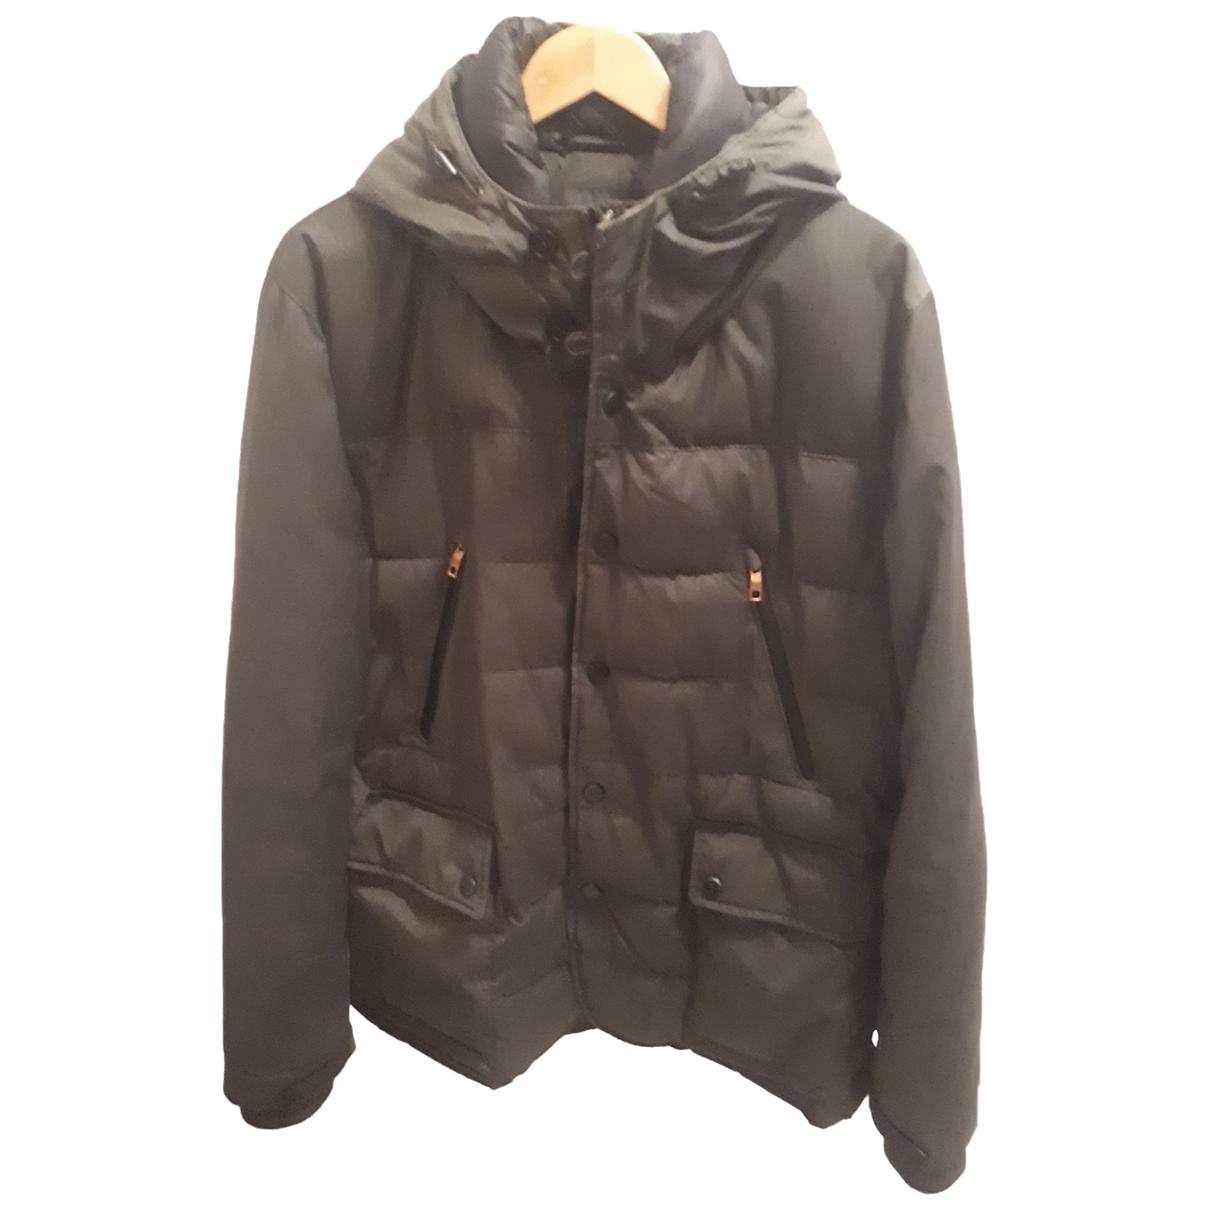 Zara \N Grey jacket  for Men XL International